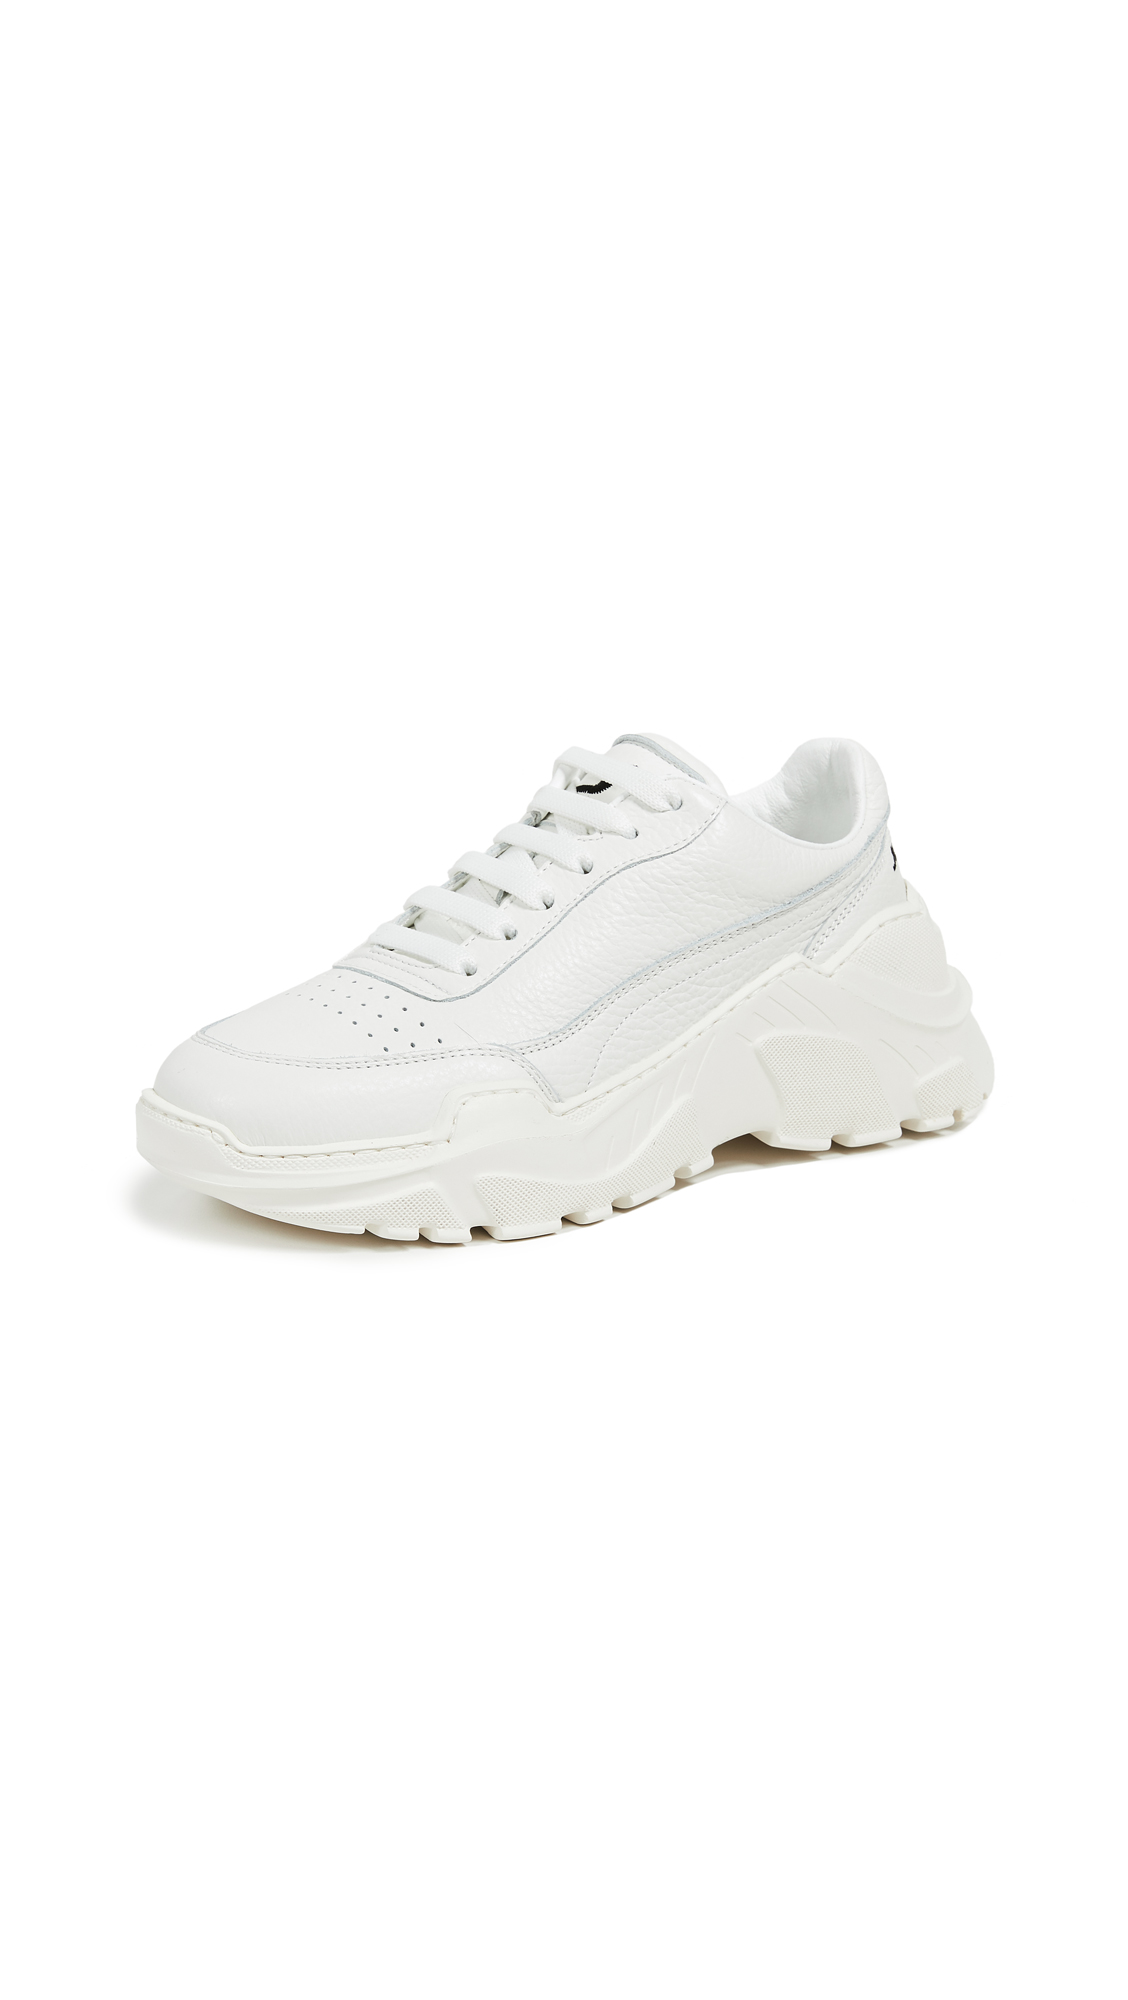 Joshua Sanders Zenith Sneakers - Black/White